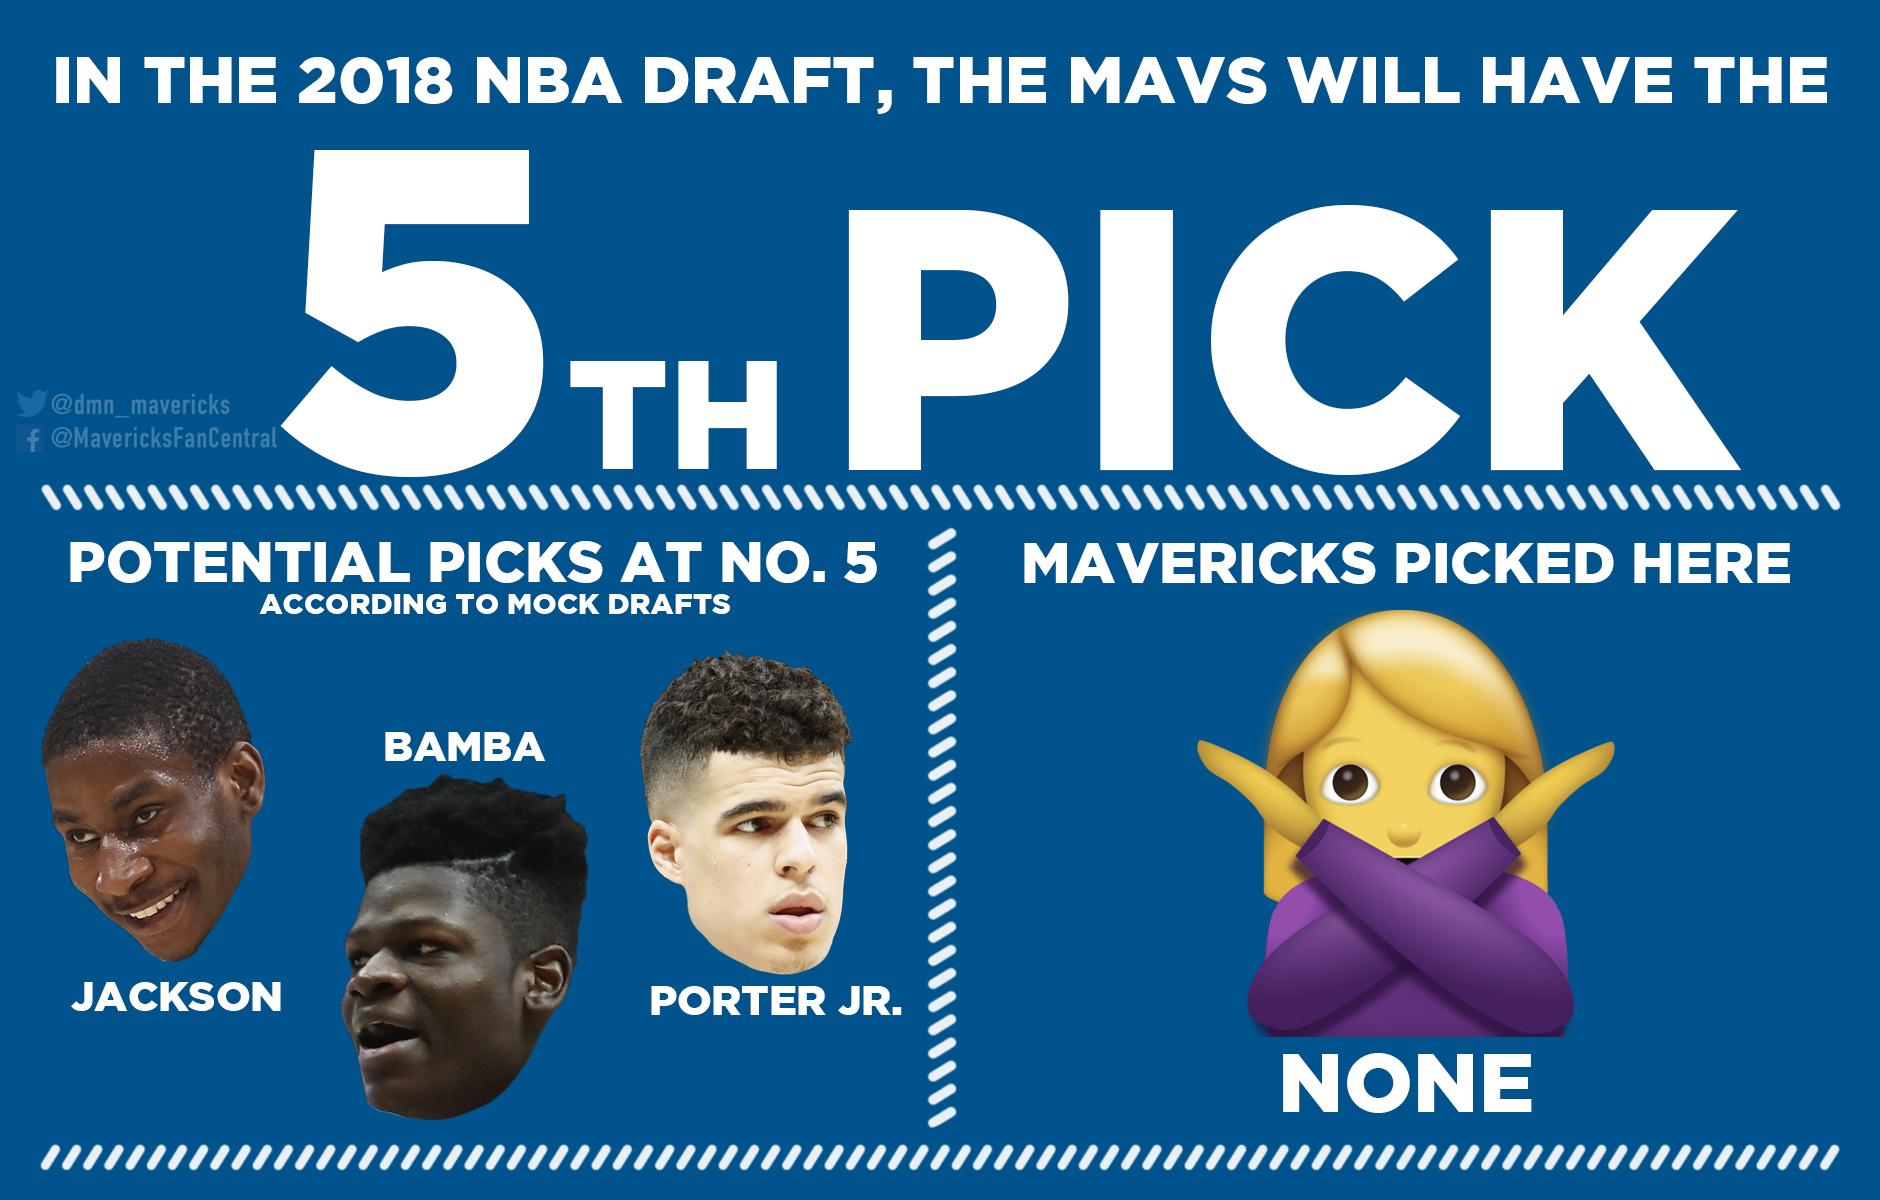 Mavericks fall two spots in lottery, will pick fifth in NBA draft